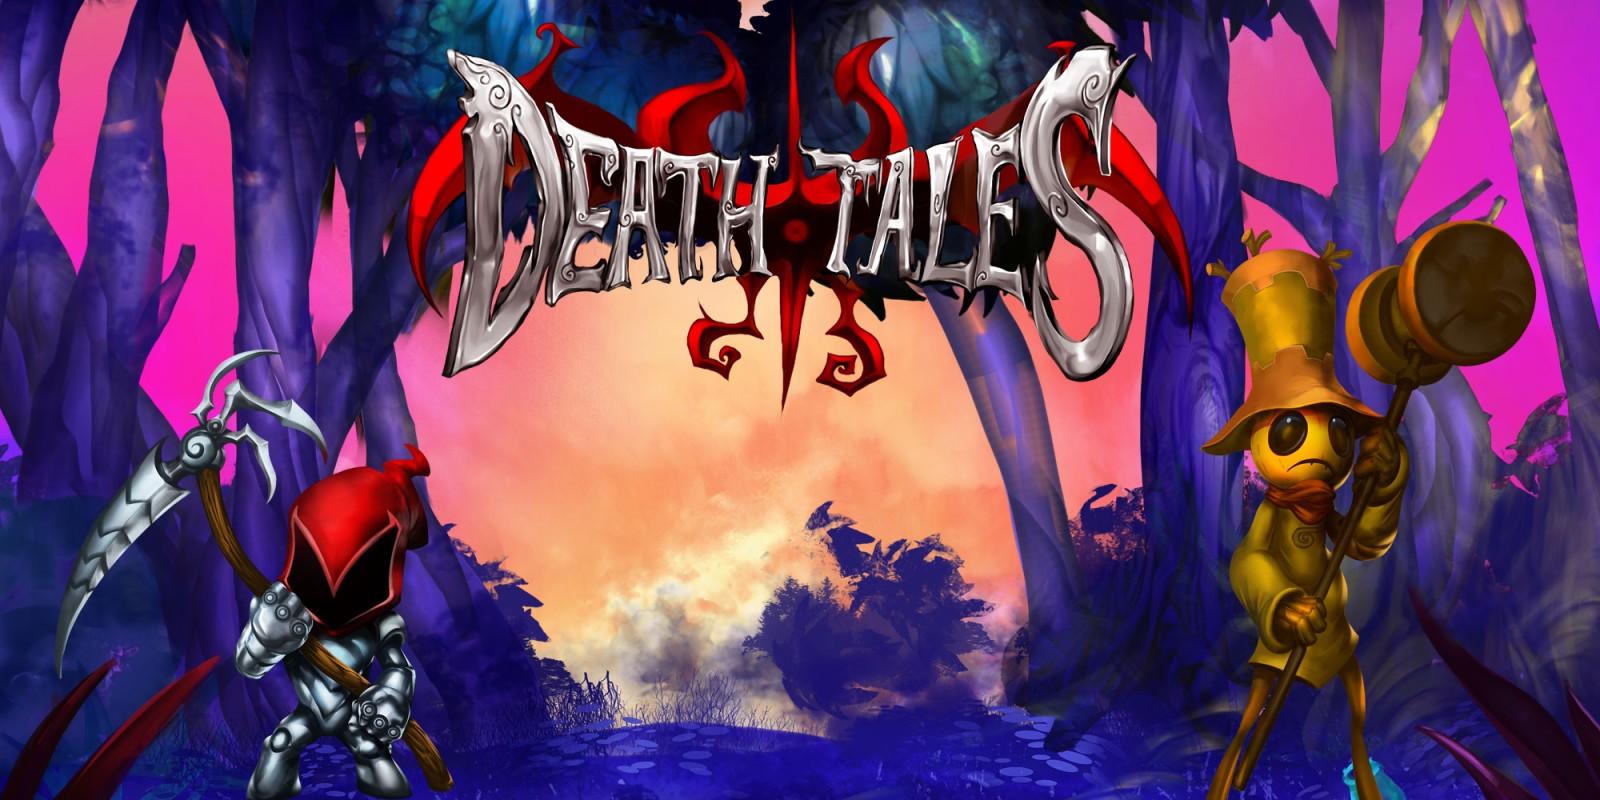 Death Tales